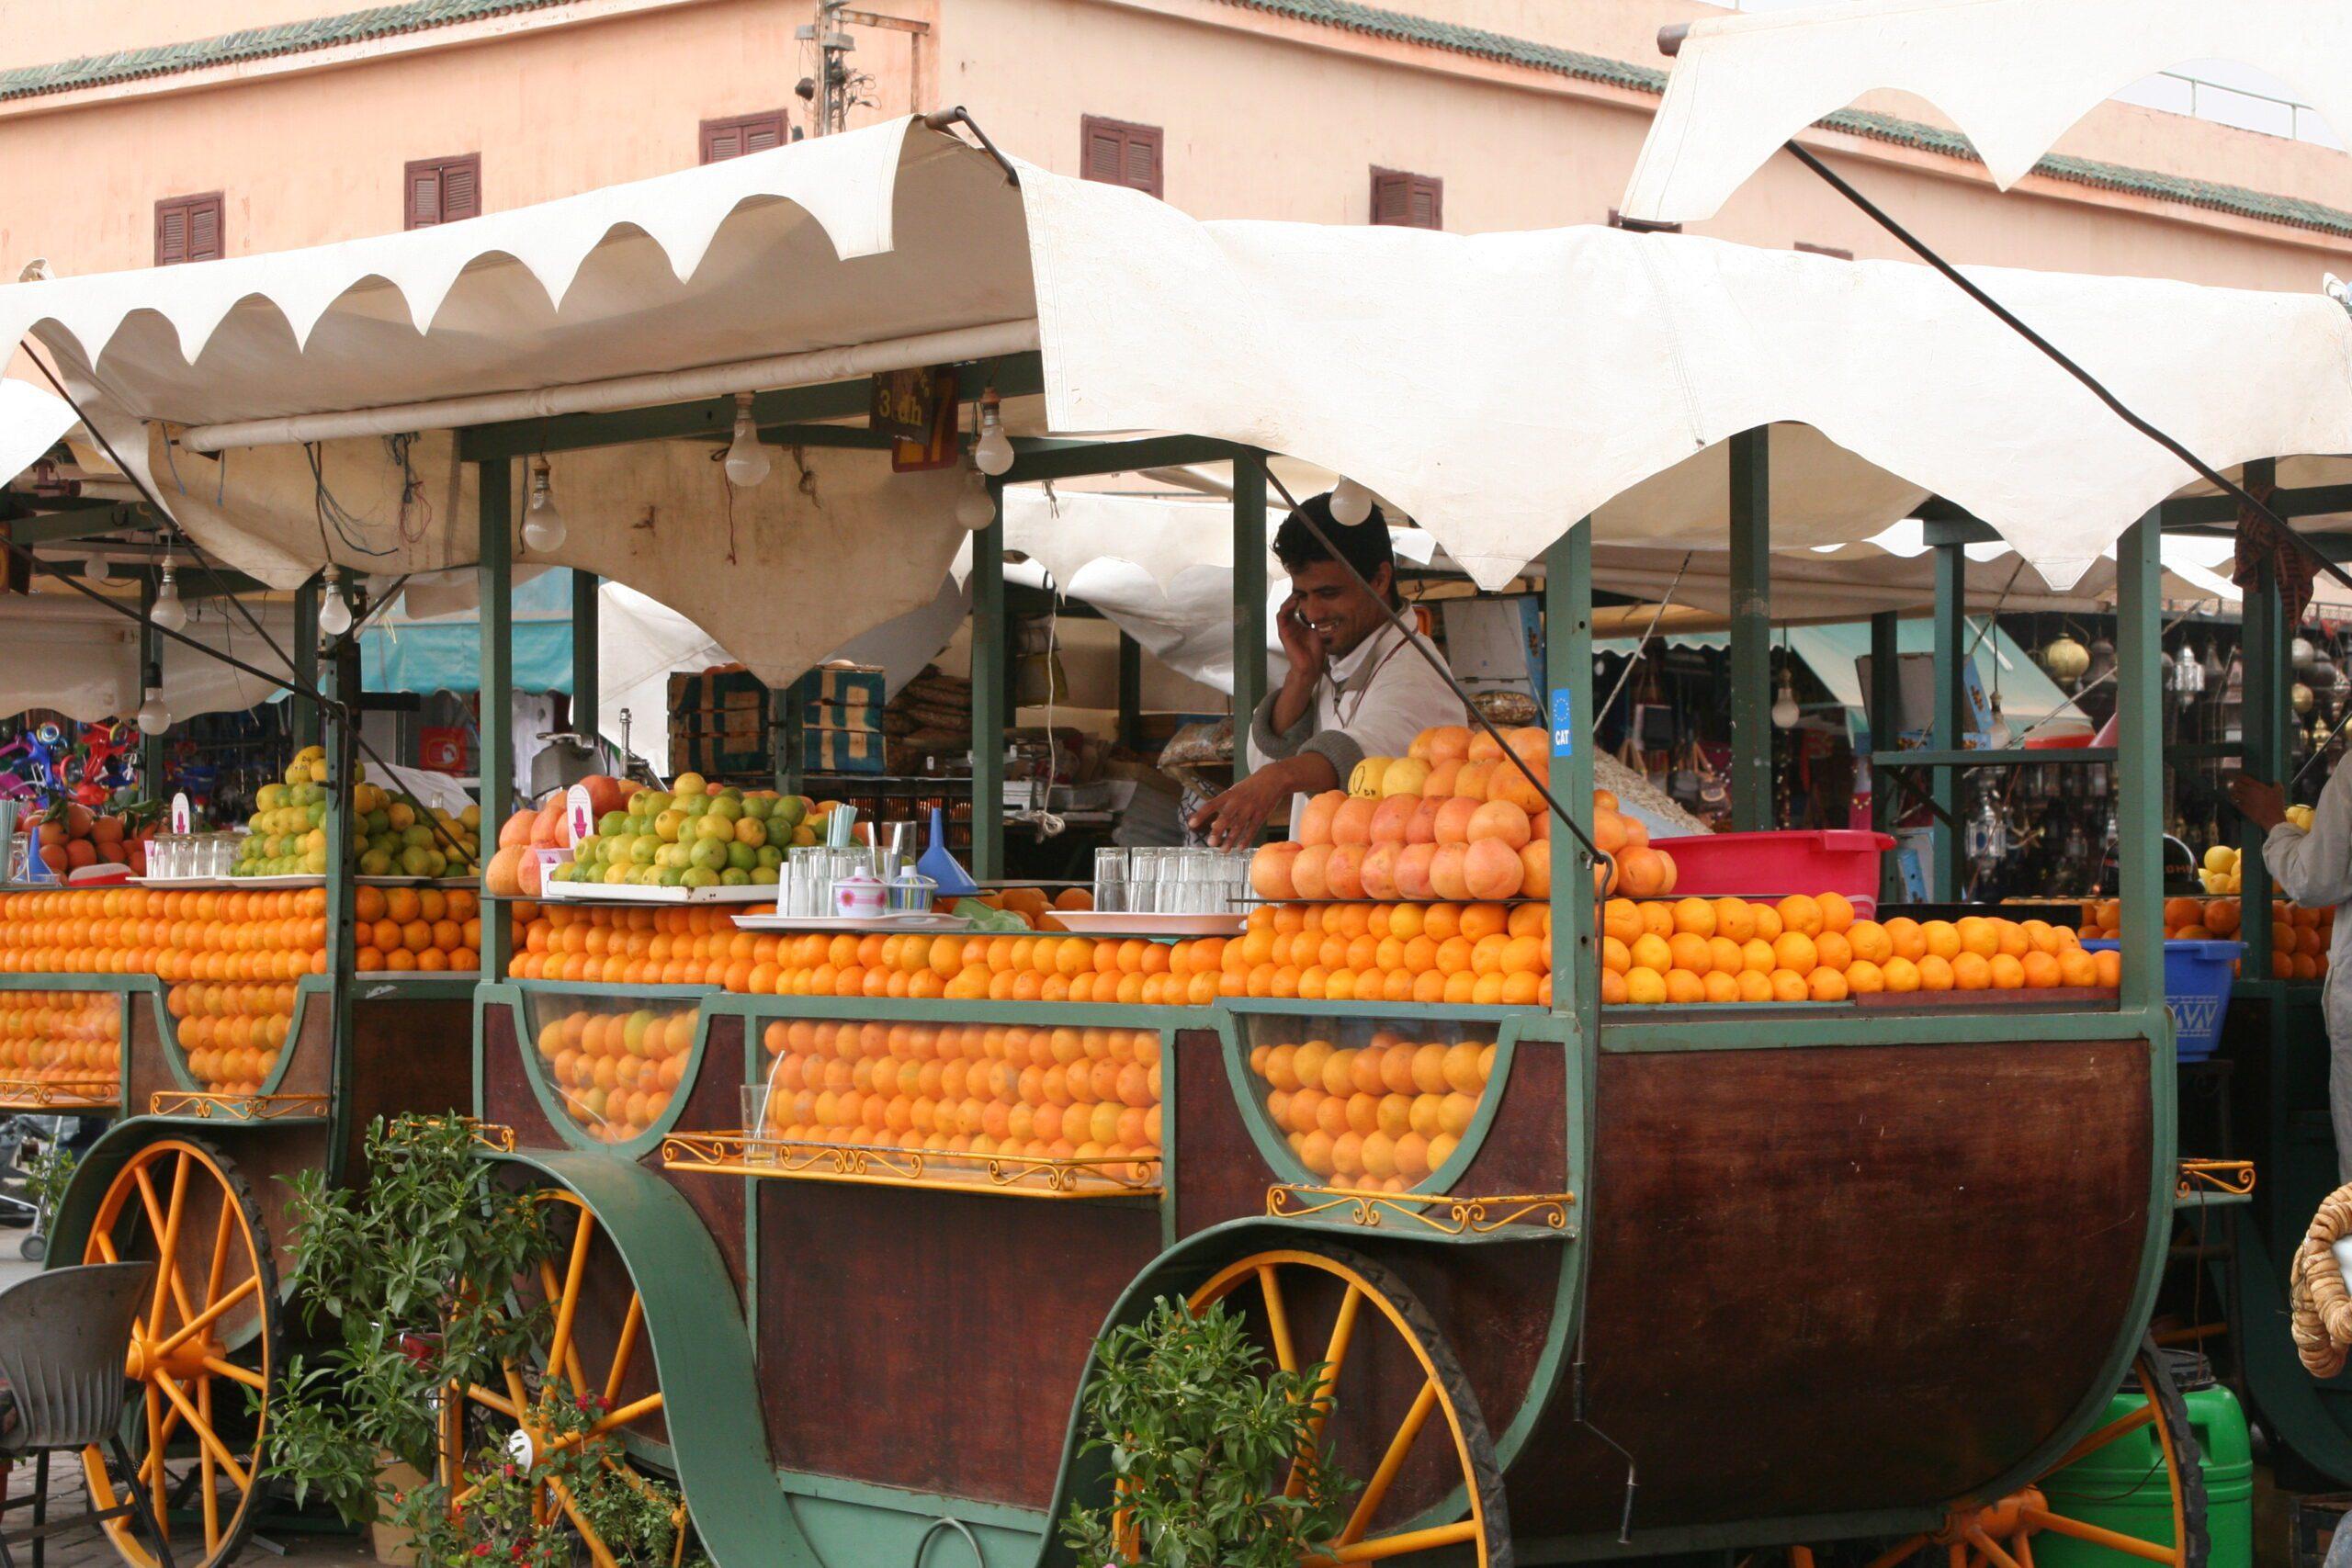 Fruit stall in marrakech